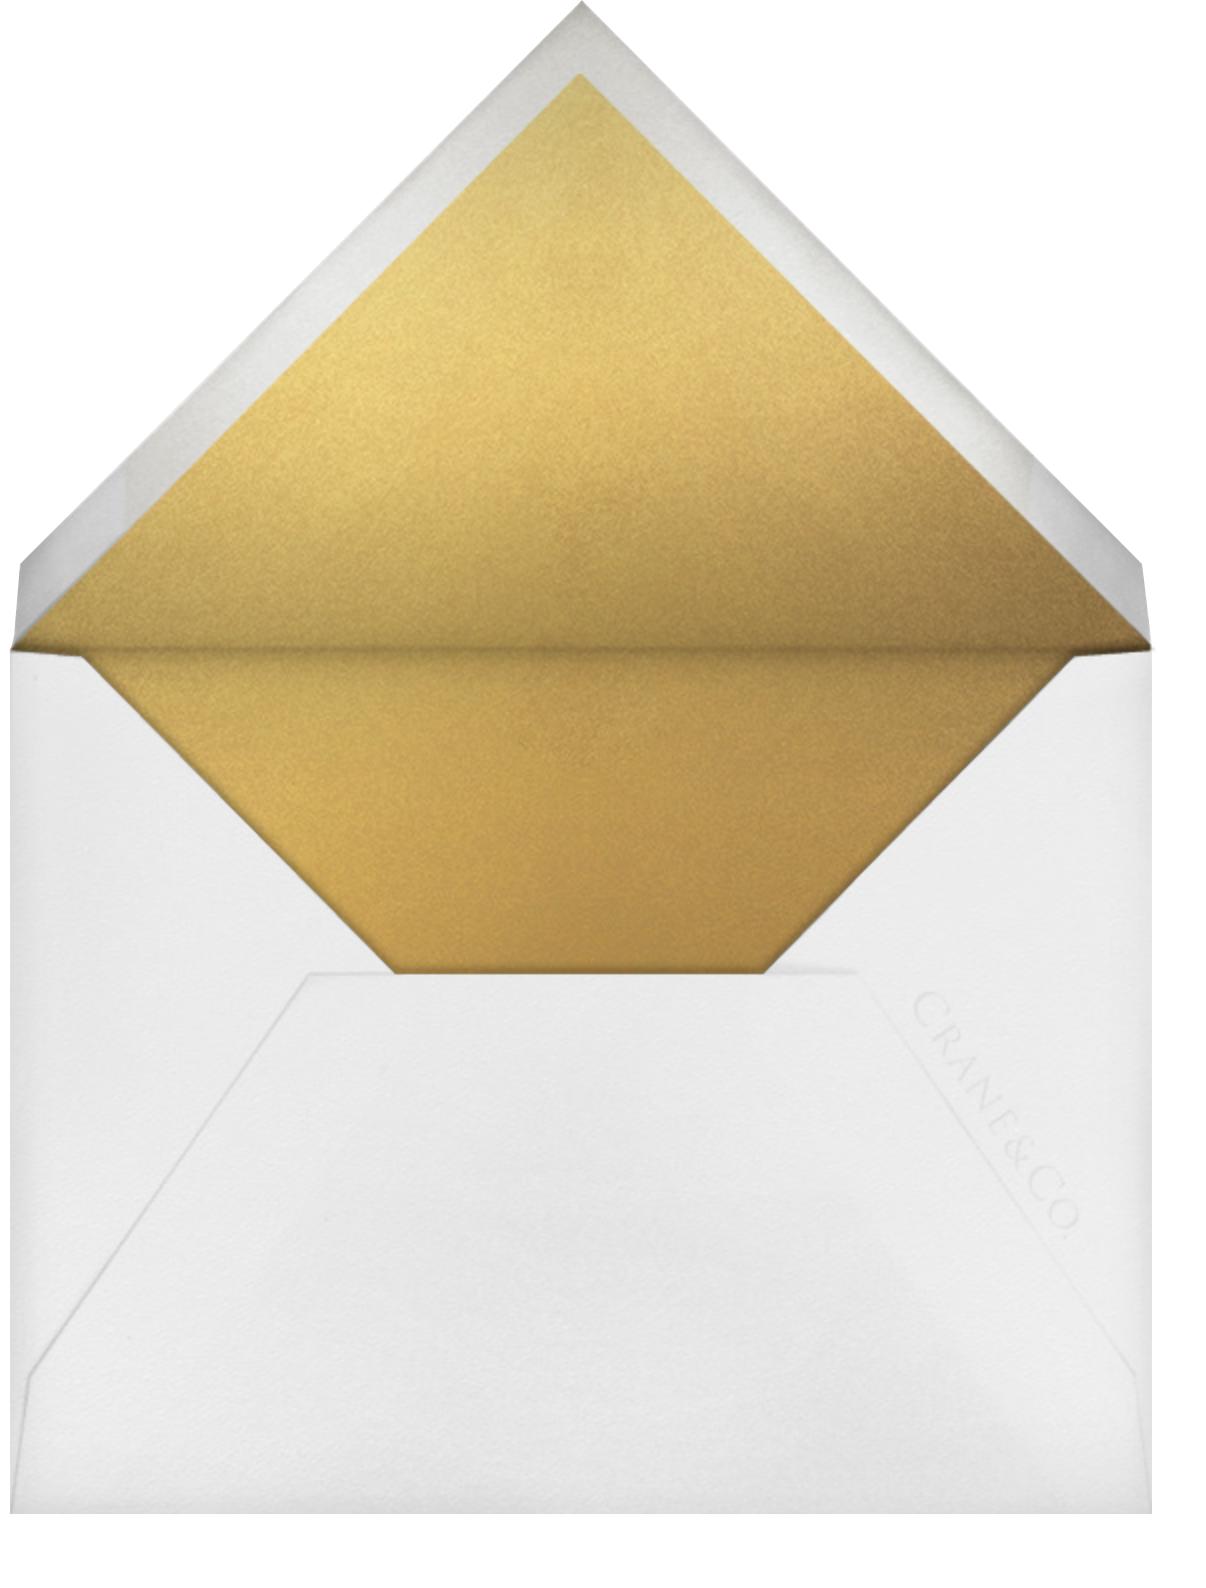 Soave - Paperless Post - Envelope